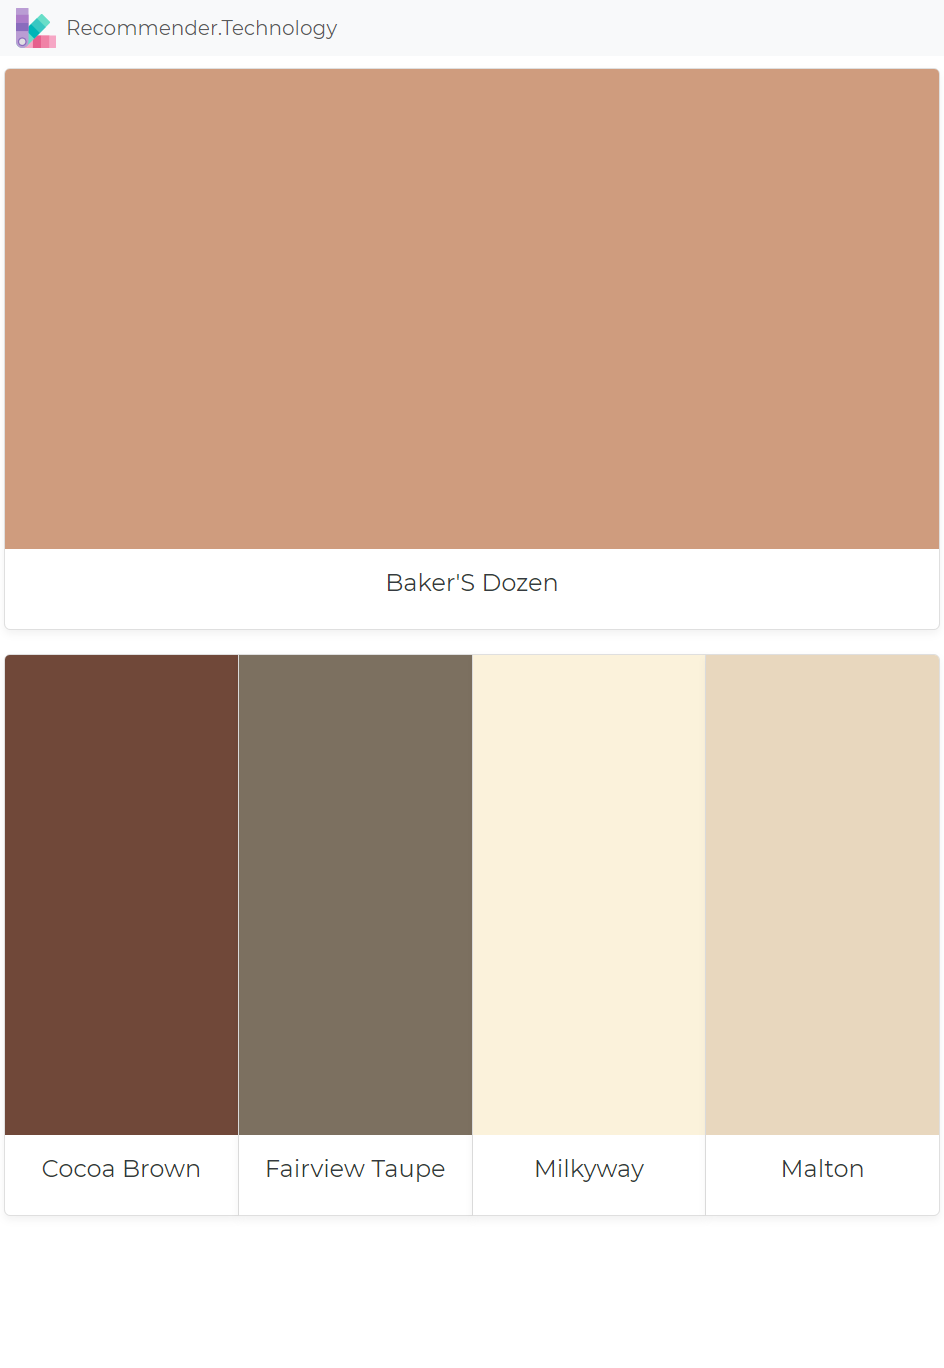 Baker S Dozen Cocoa Brown Fairview Taupe Milkyway Malton Paint Colors For Home Perfect Paint Color Paint Colors Benjamin Moore